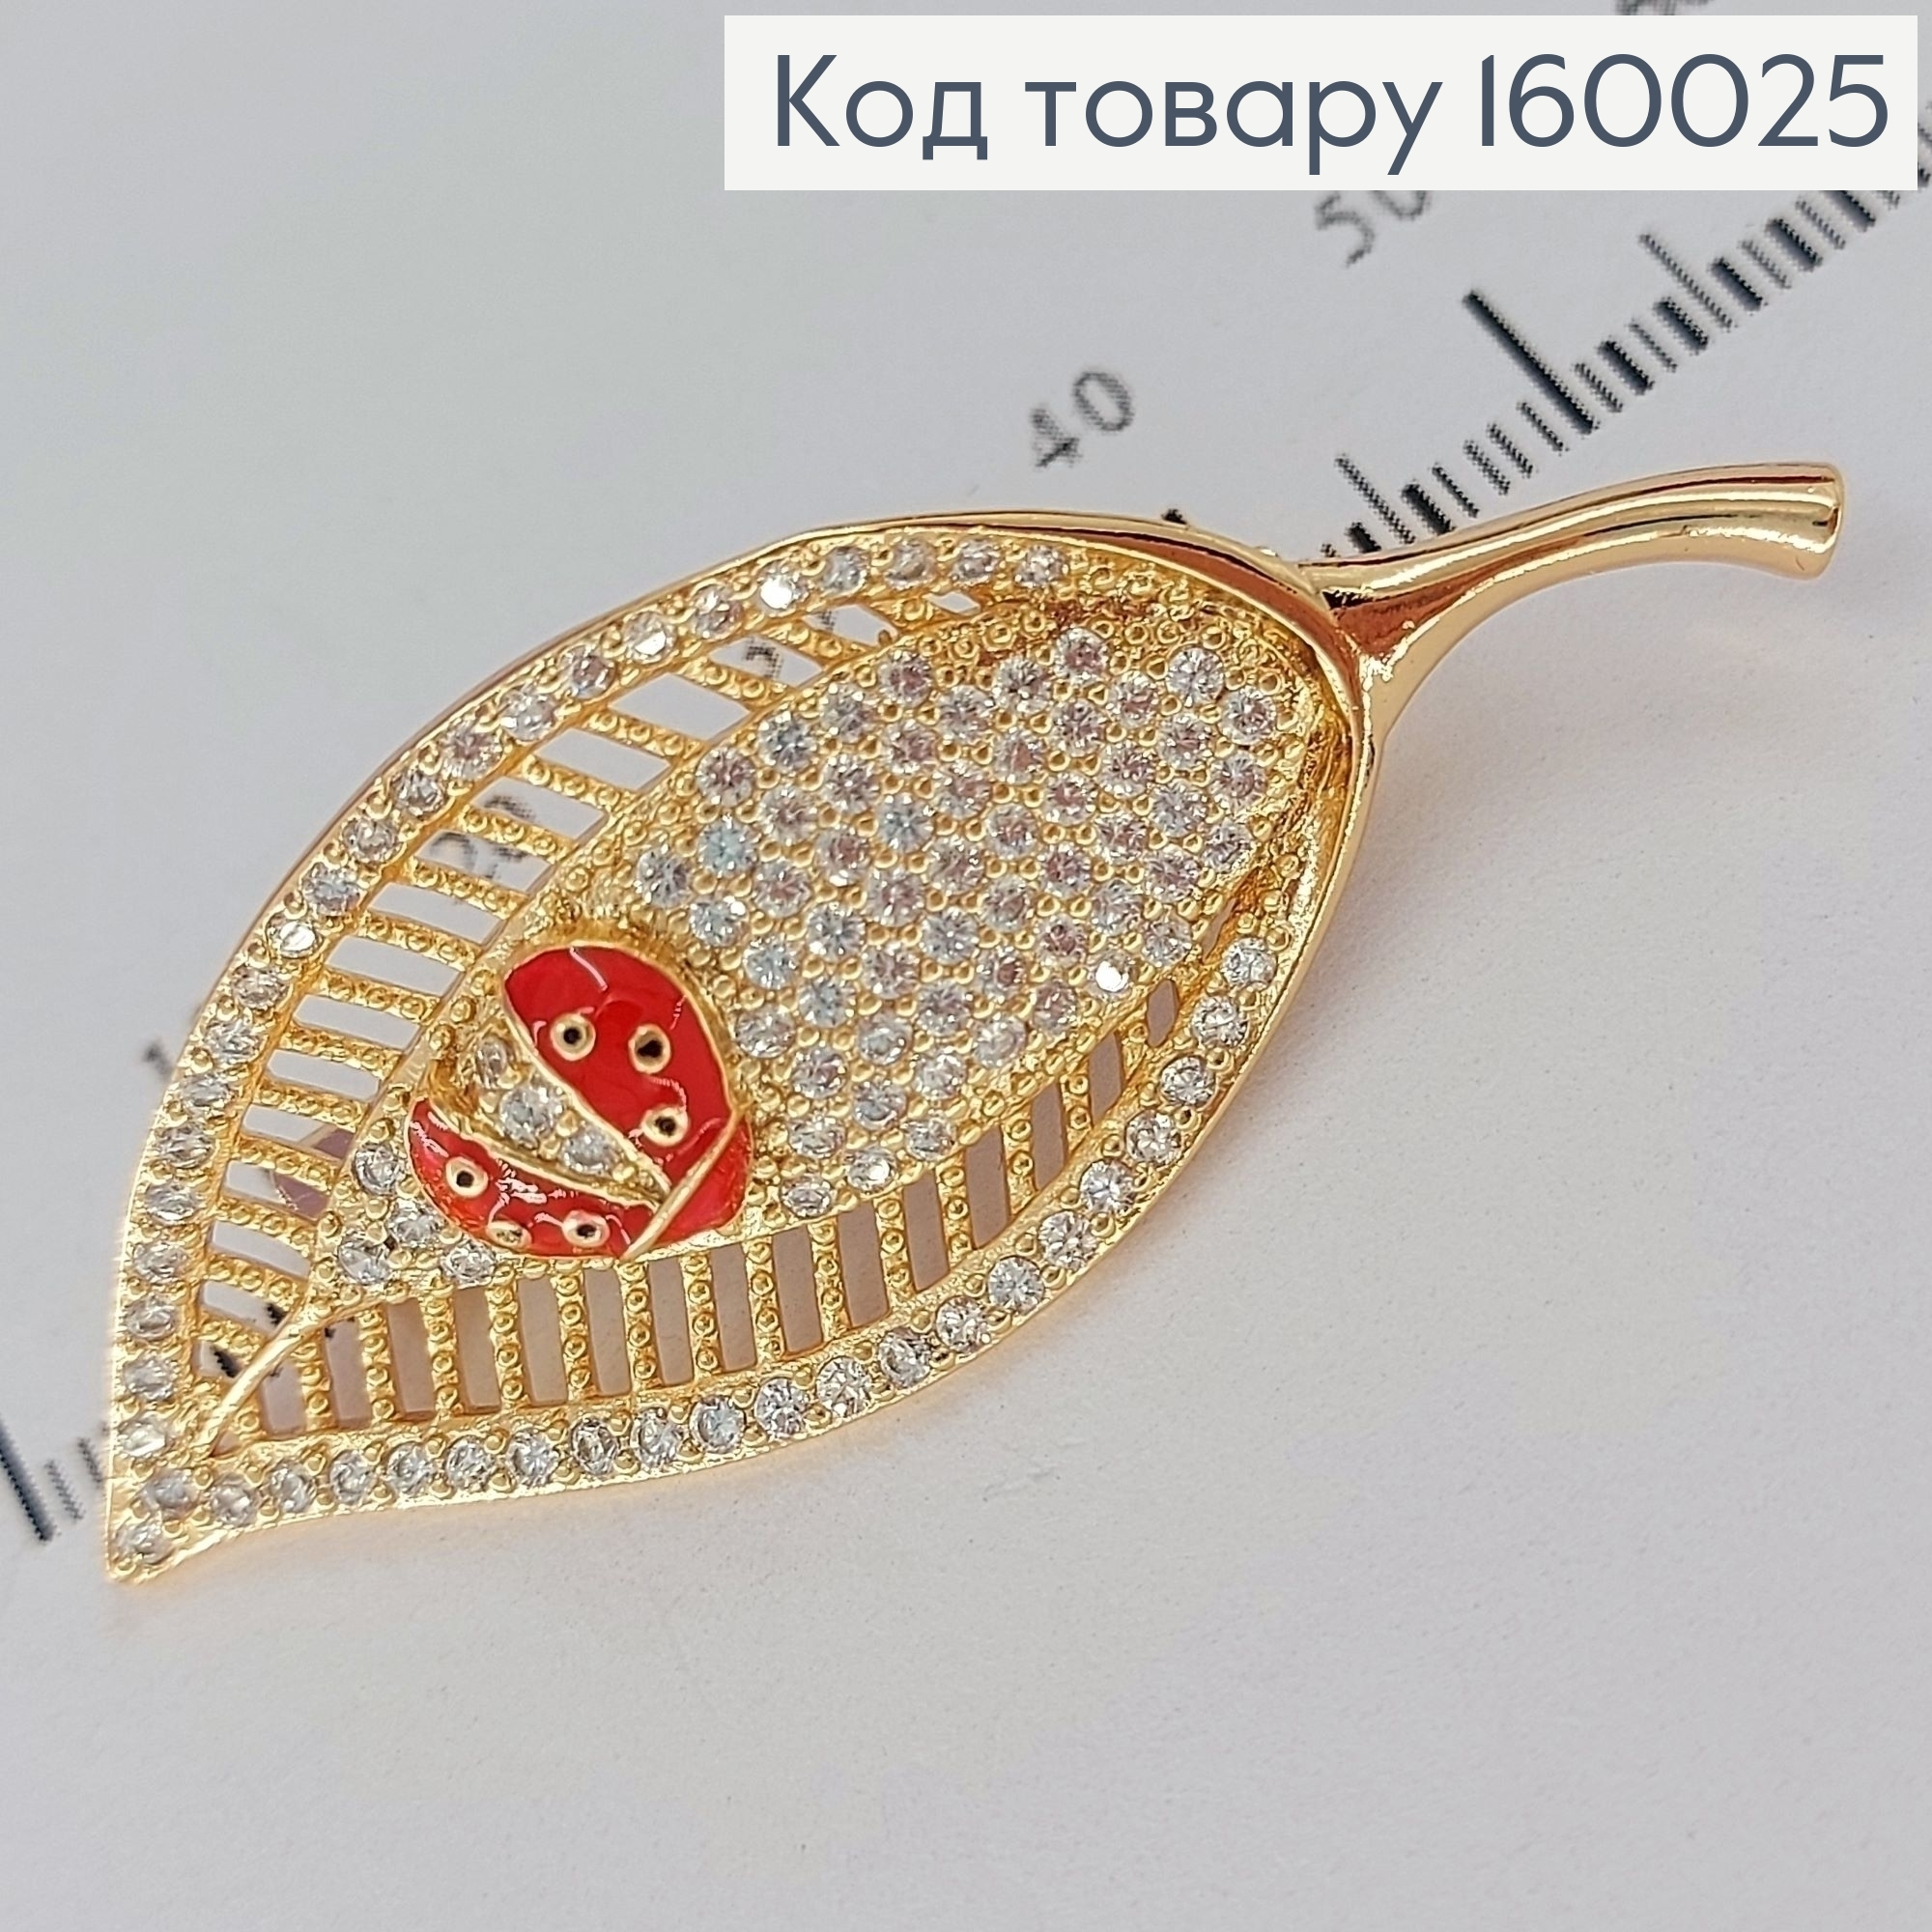 Брошка листочок з бедриком  в камінцях медичне золото  Xuping 18к 160025 фото 1